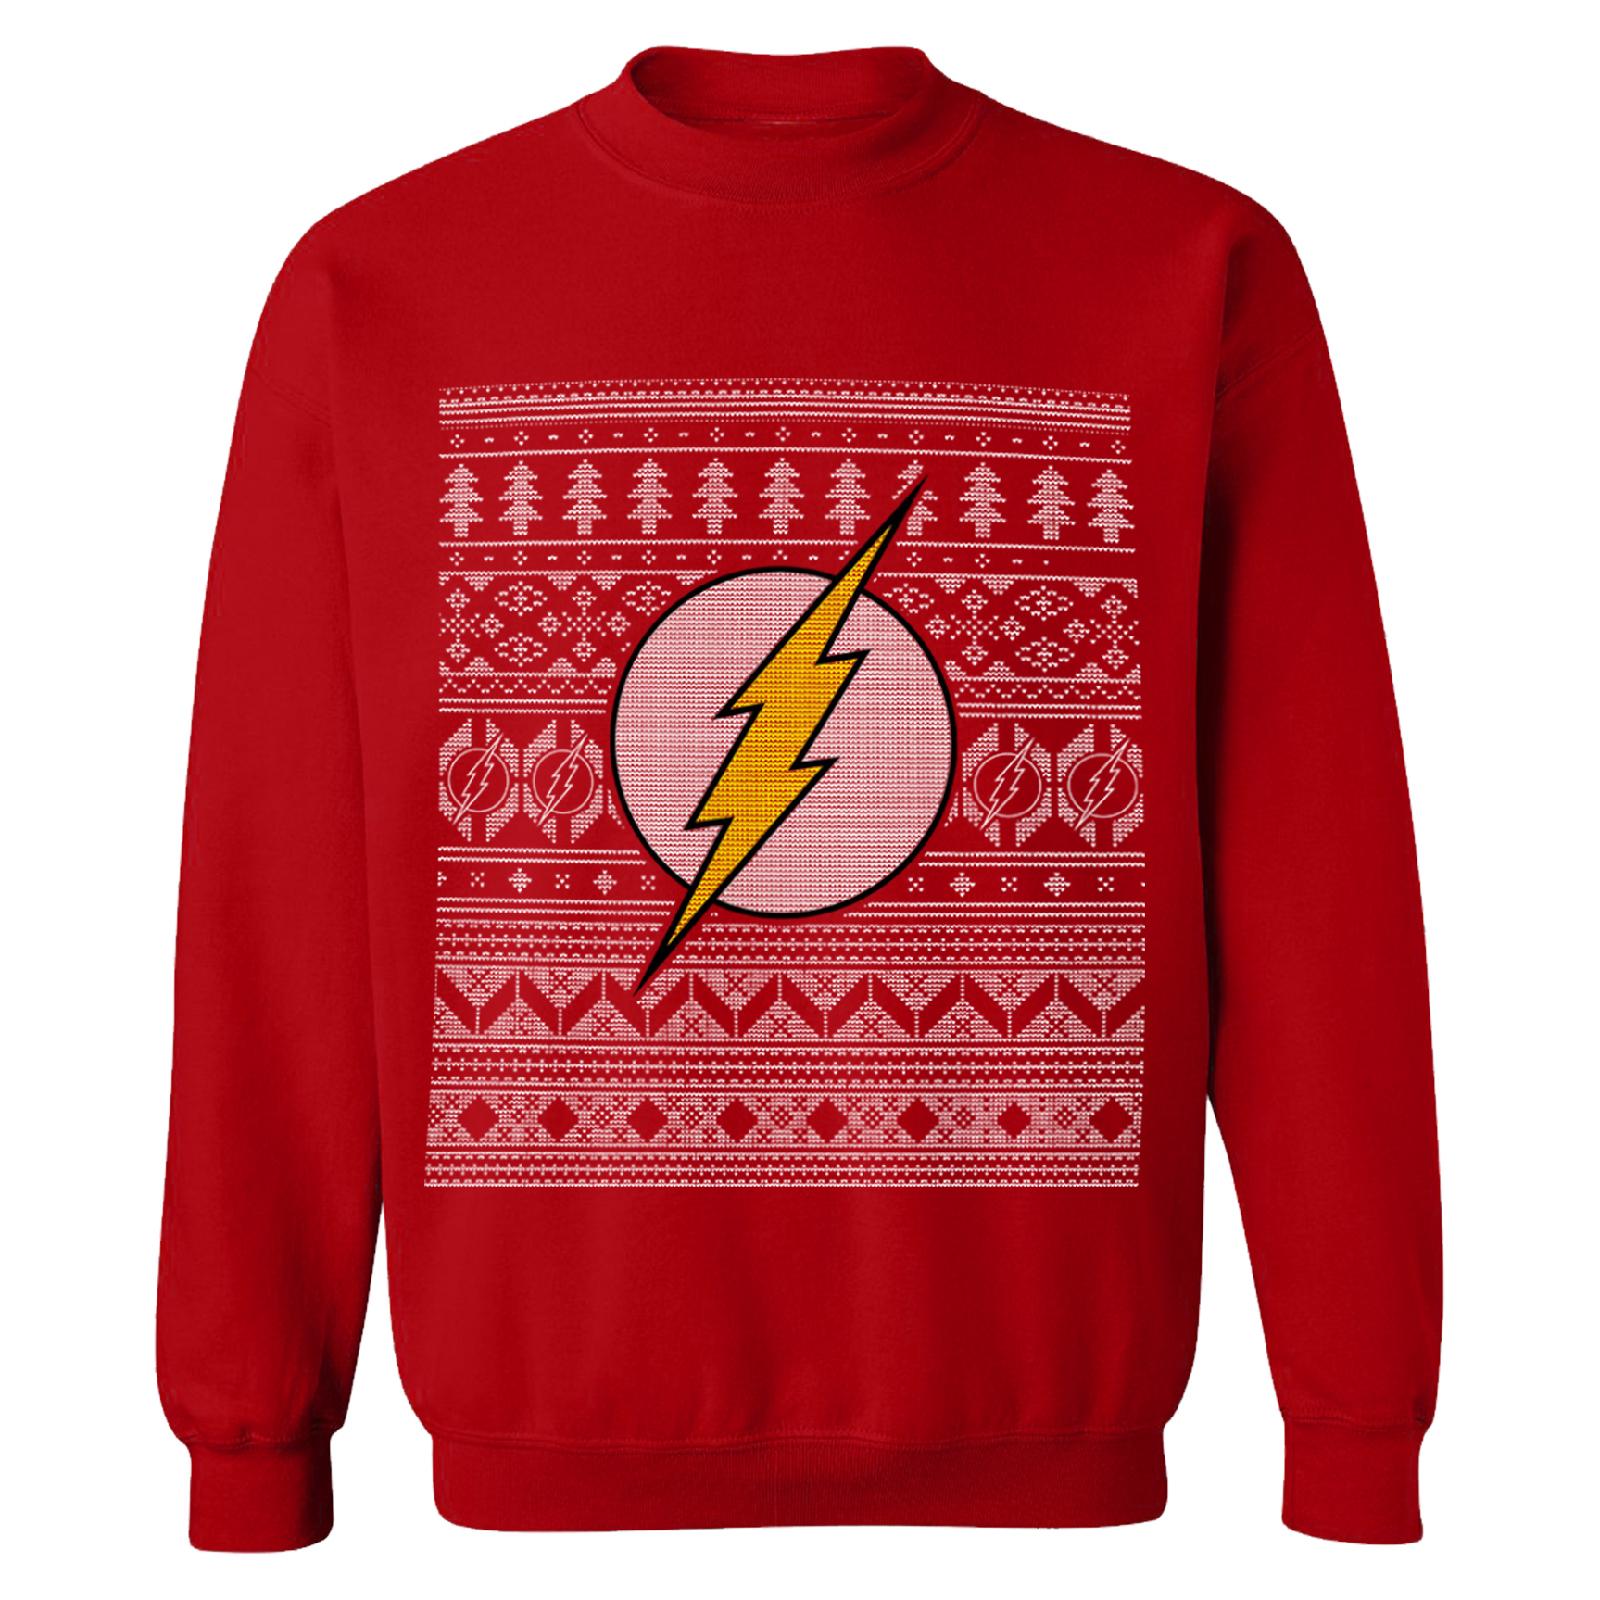 Uniseks Kersttrui.Dc Comics Men S The Flash Christmas Fairisle Sweatshirt Red